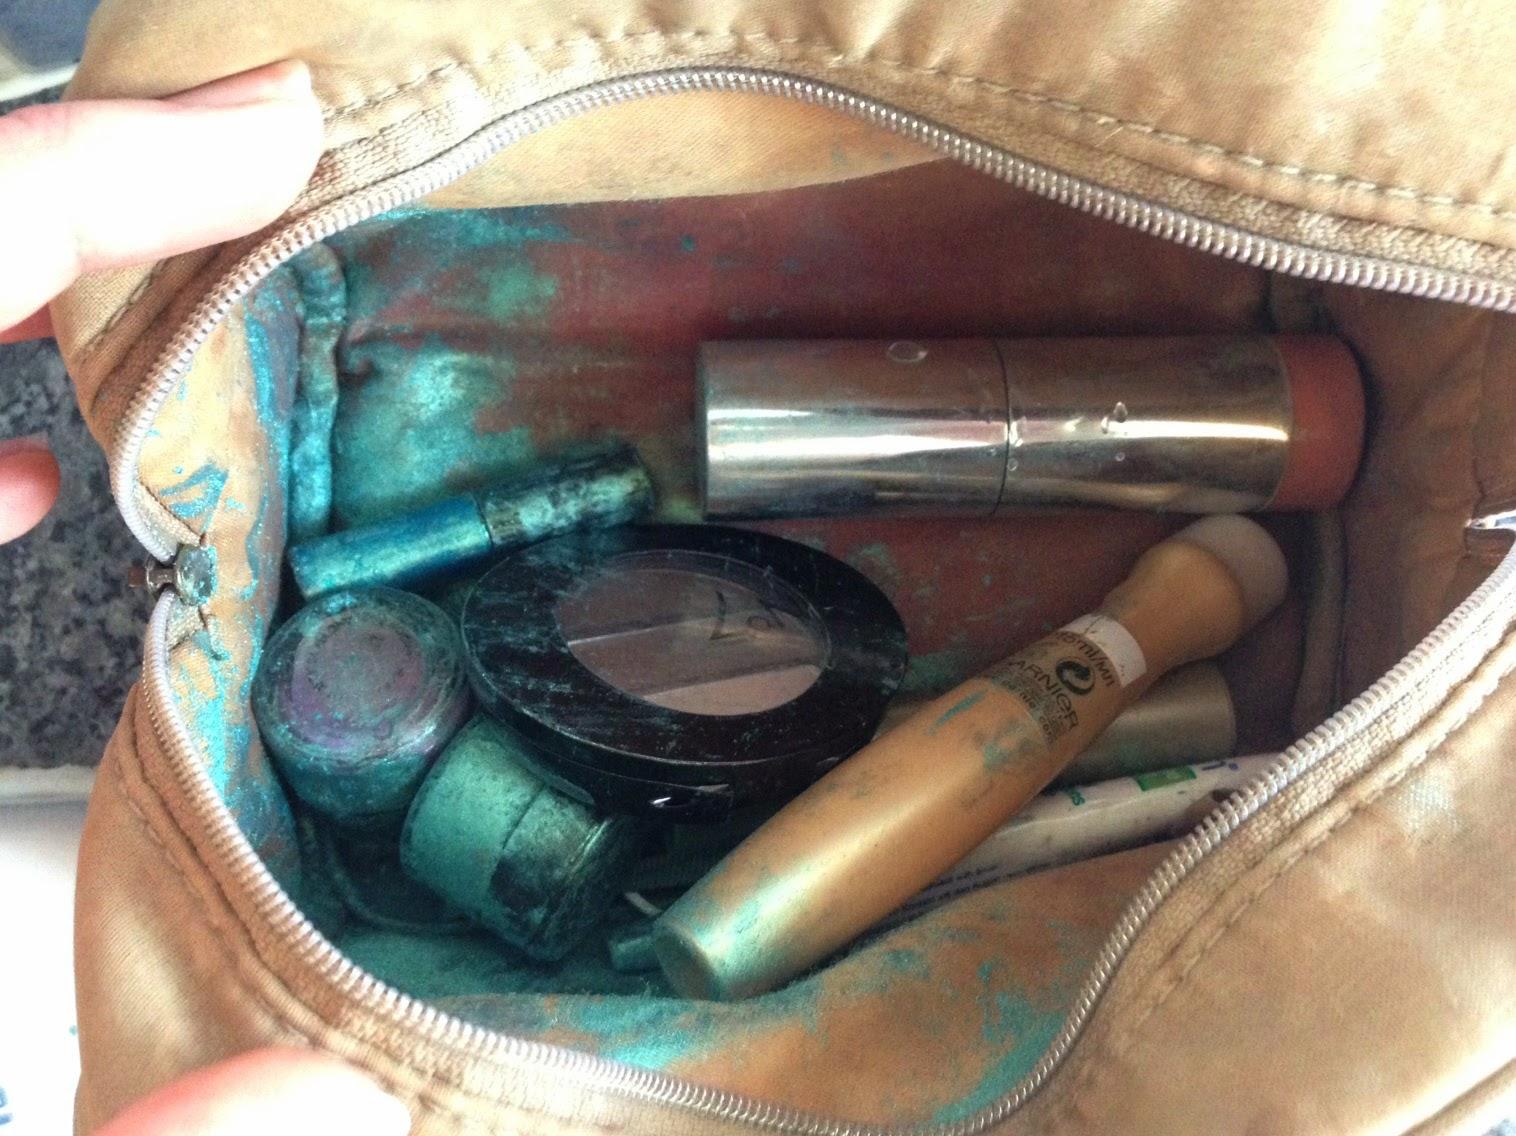 Make up bag full of green eye shadow